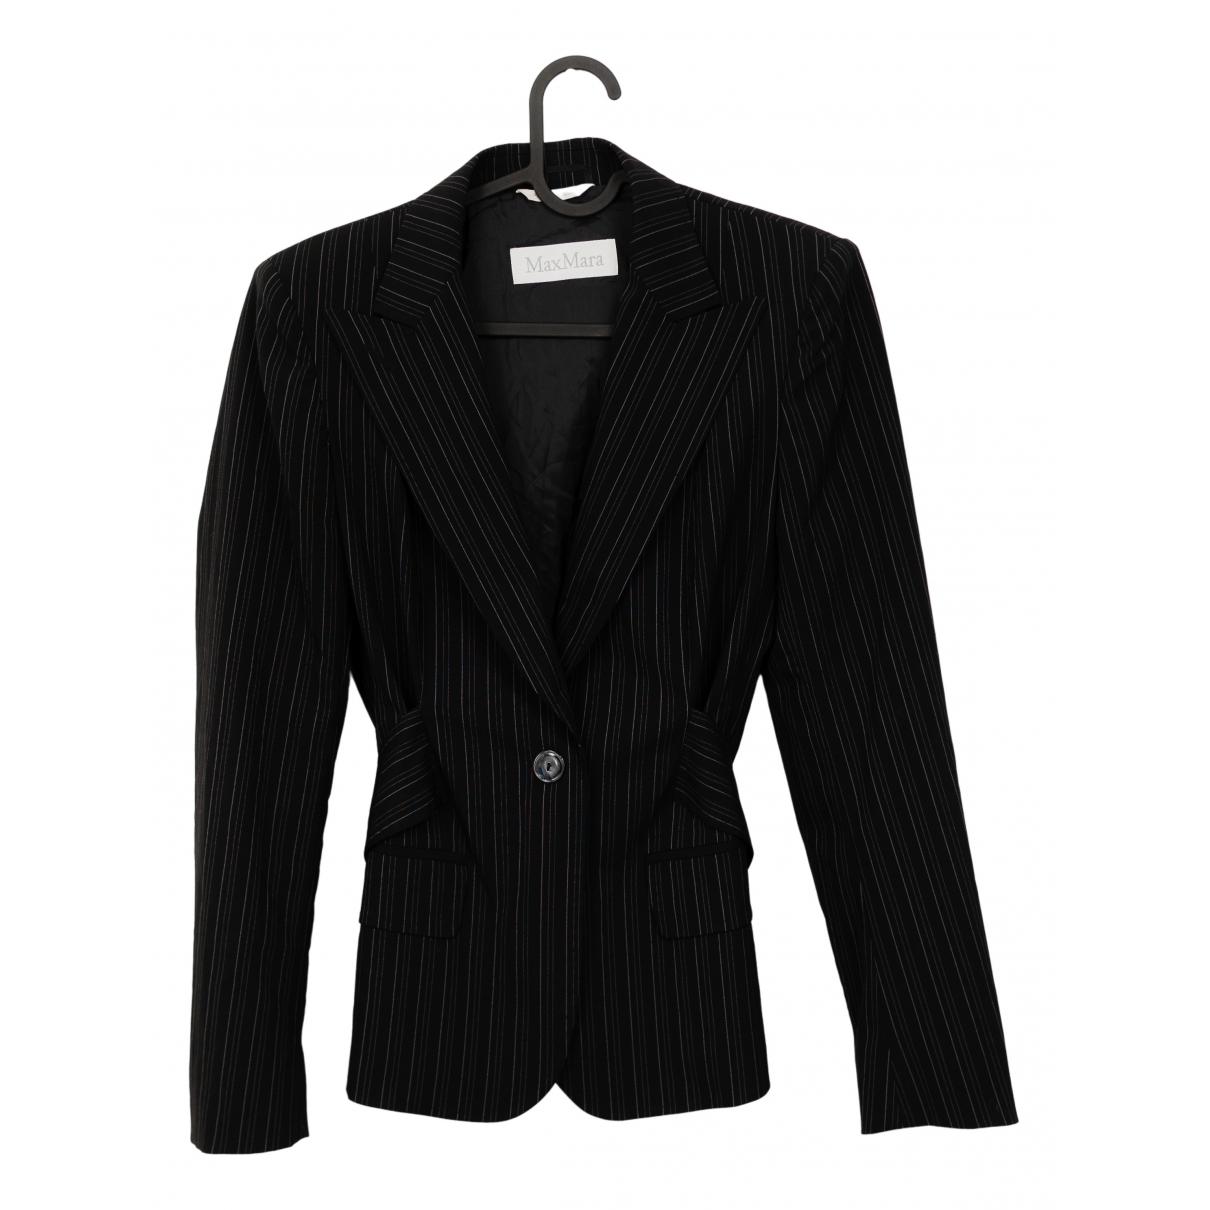 Max Mara \N Black Wool jacket for Women 36 IT